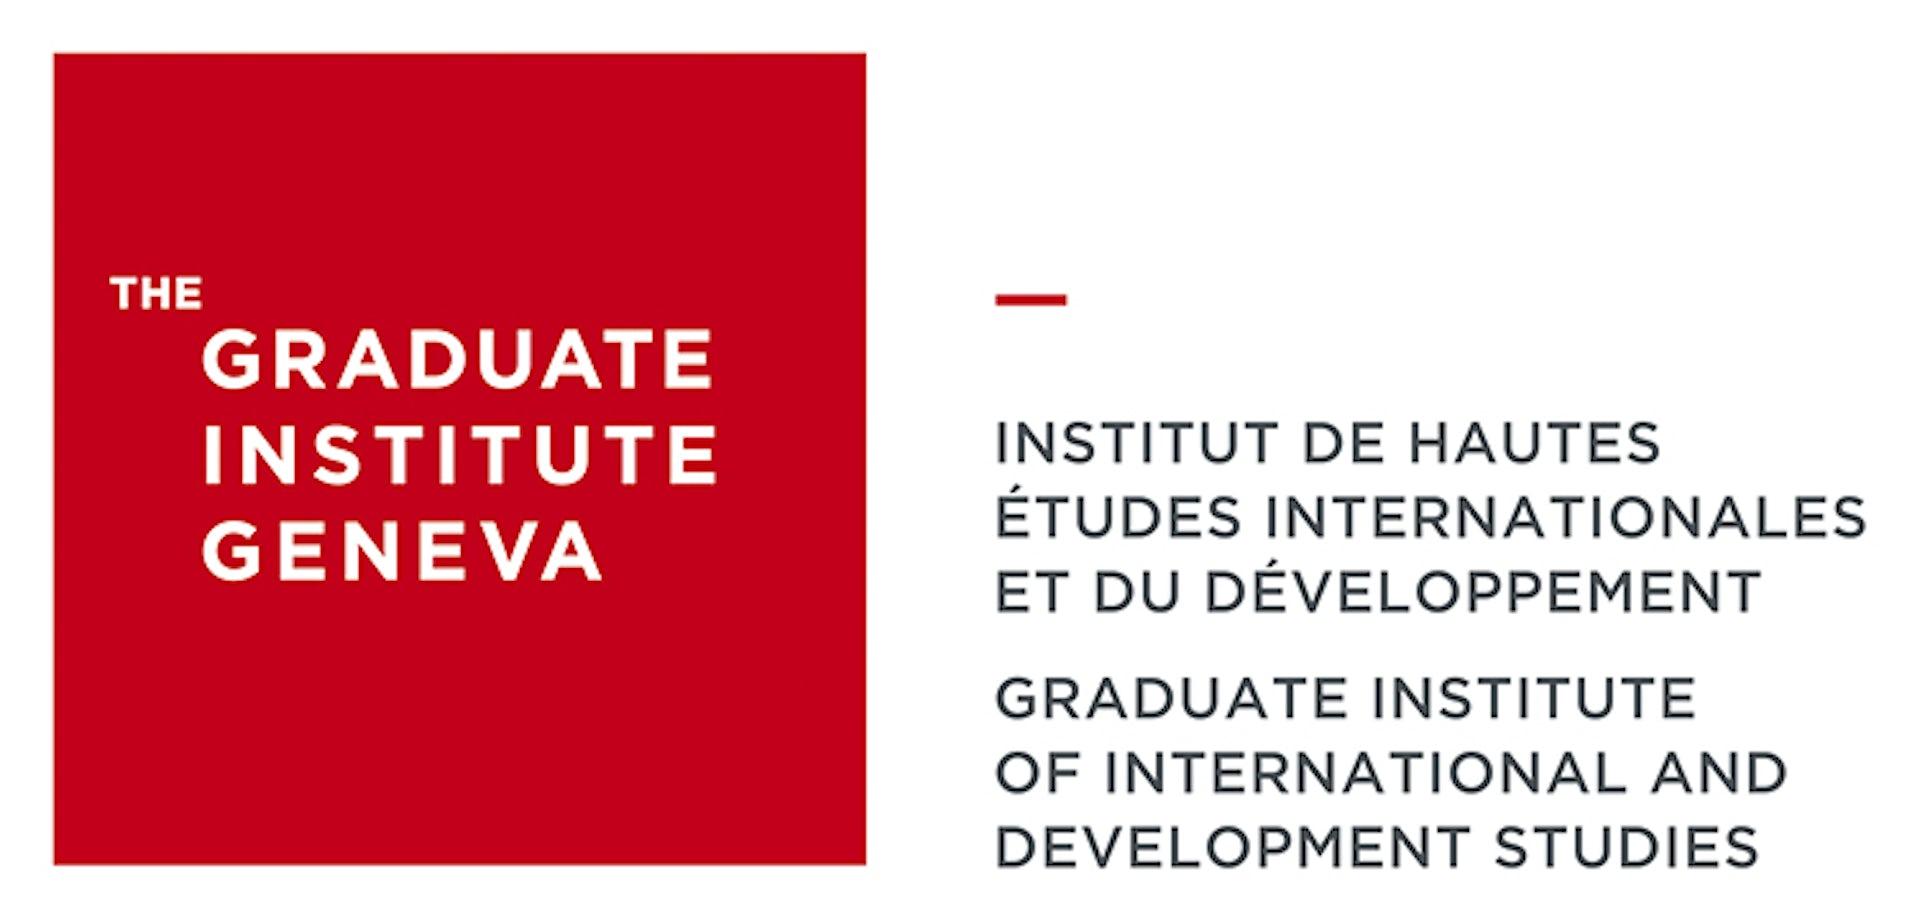 Graduate Institute - Institut de hautes études internationales et du développement (IHEID)